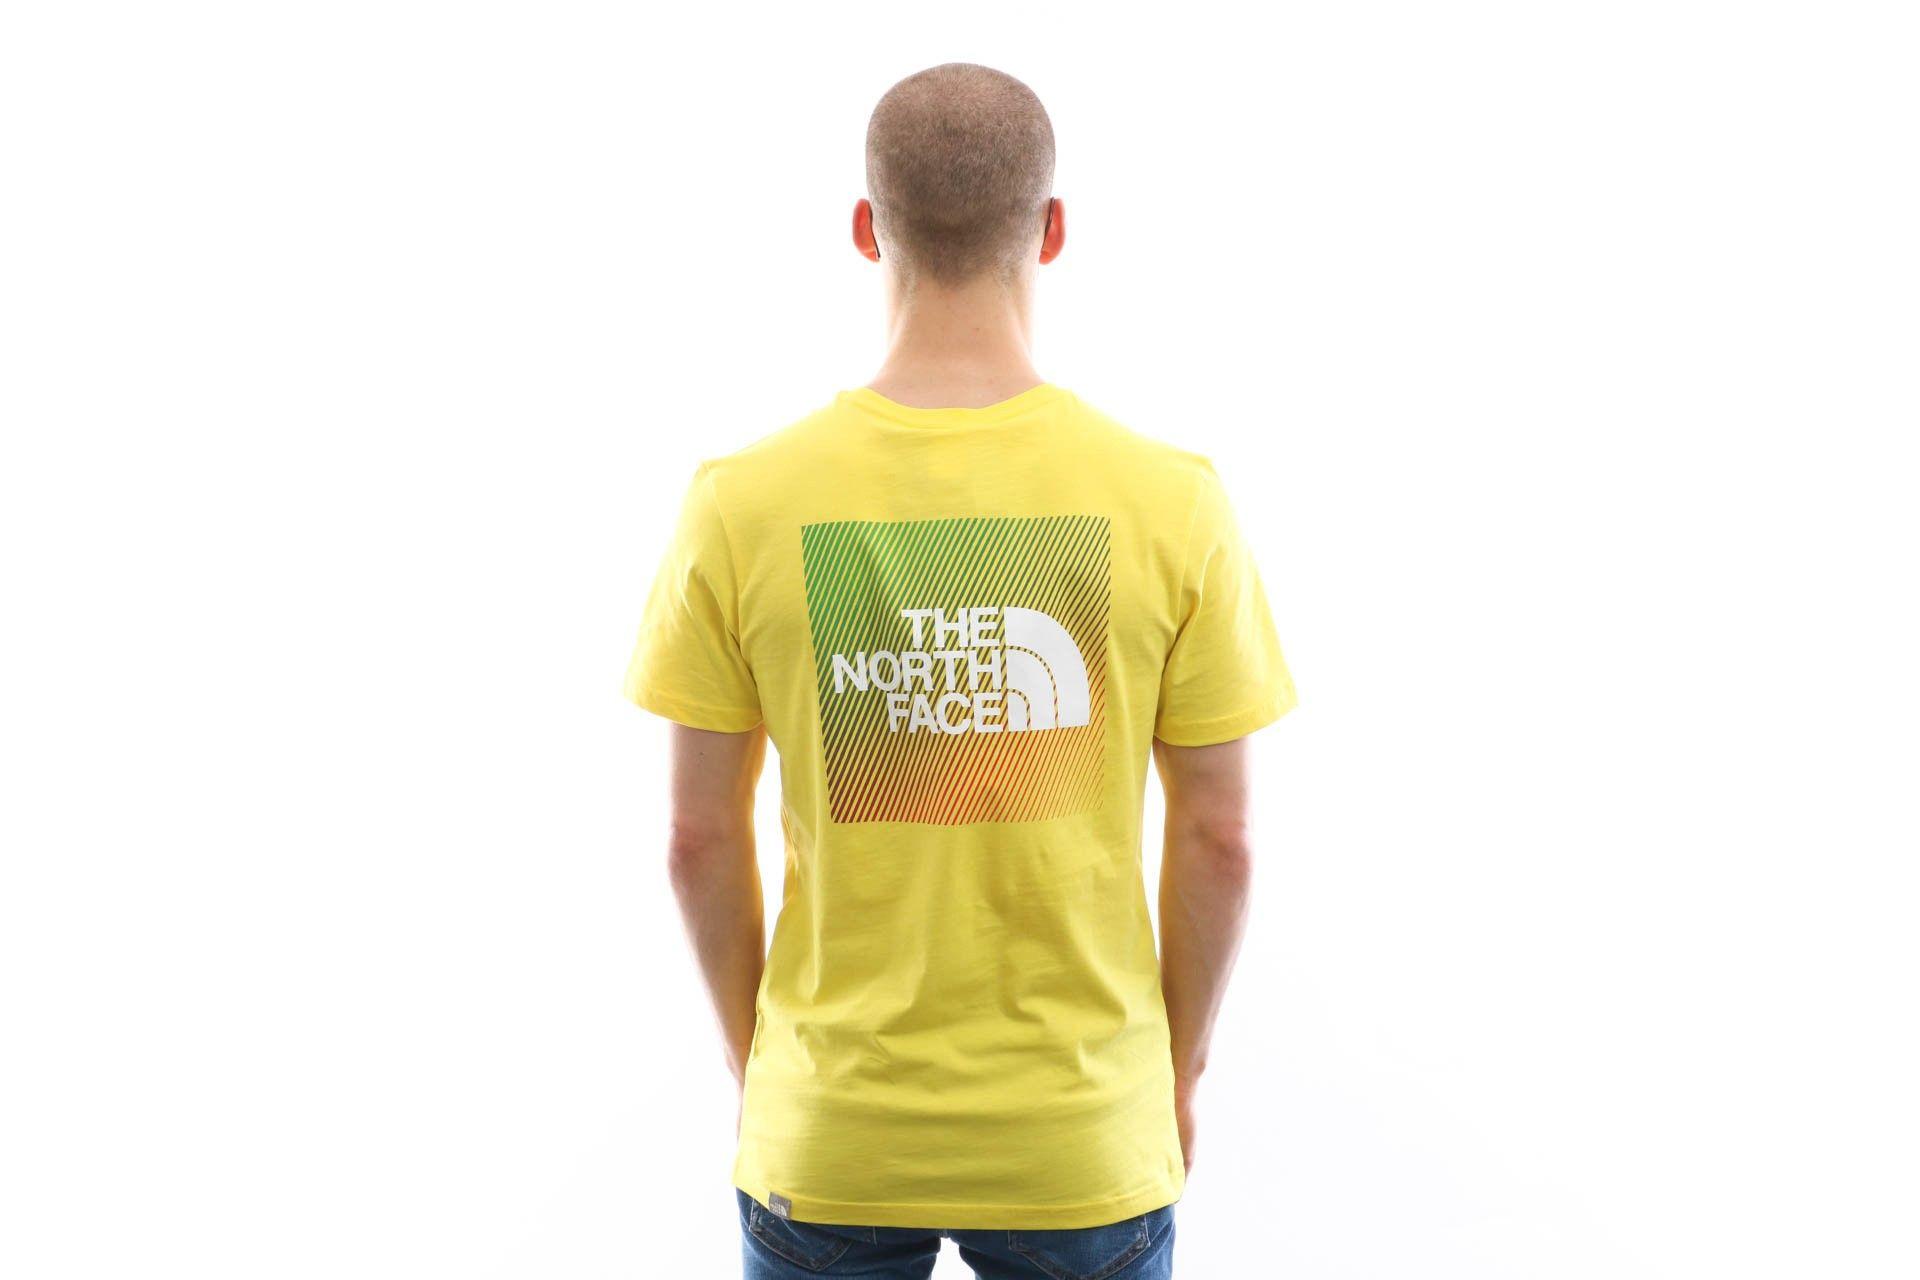 Afbeelding van The North Face T-shirt Men'S Ss Rnbw Tnf Lemon/Tnf White NF0A4M6PP76